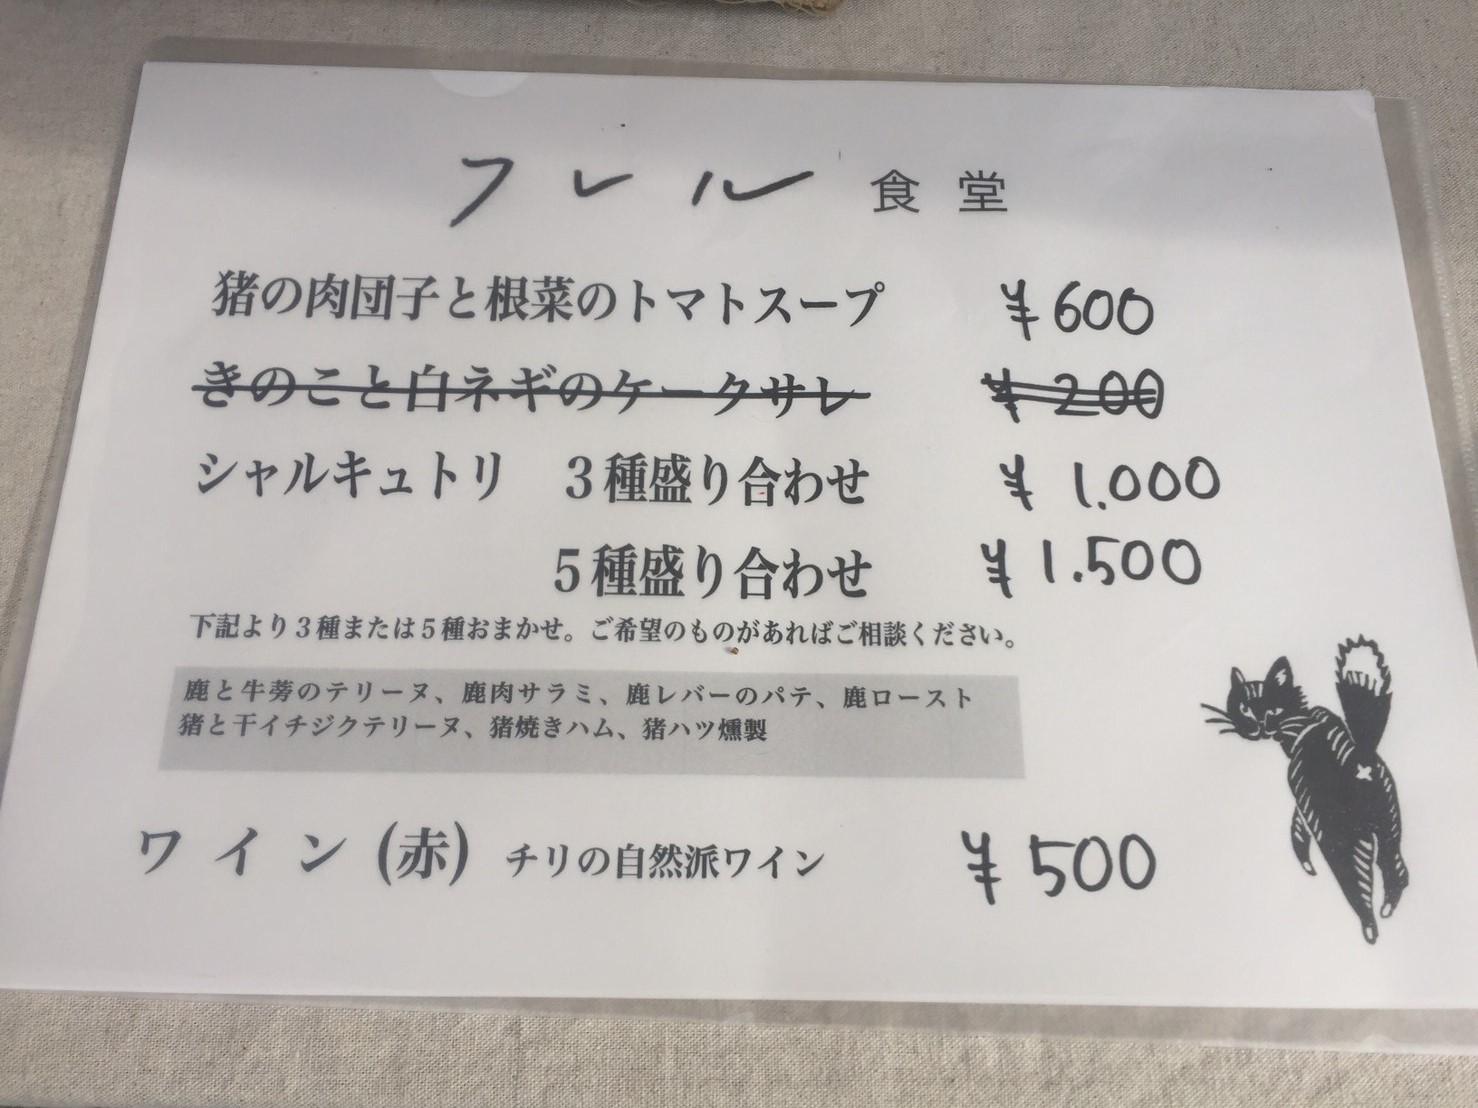 西郷工芸祭り・三滝渓_e0115904_15190368.jpg